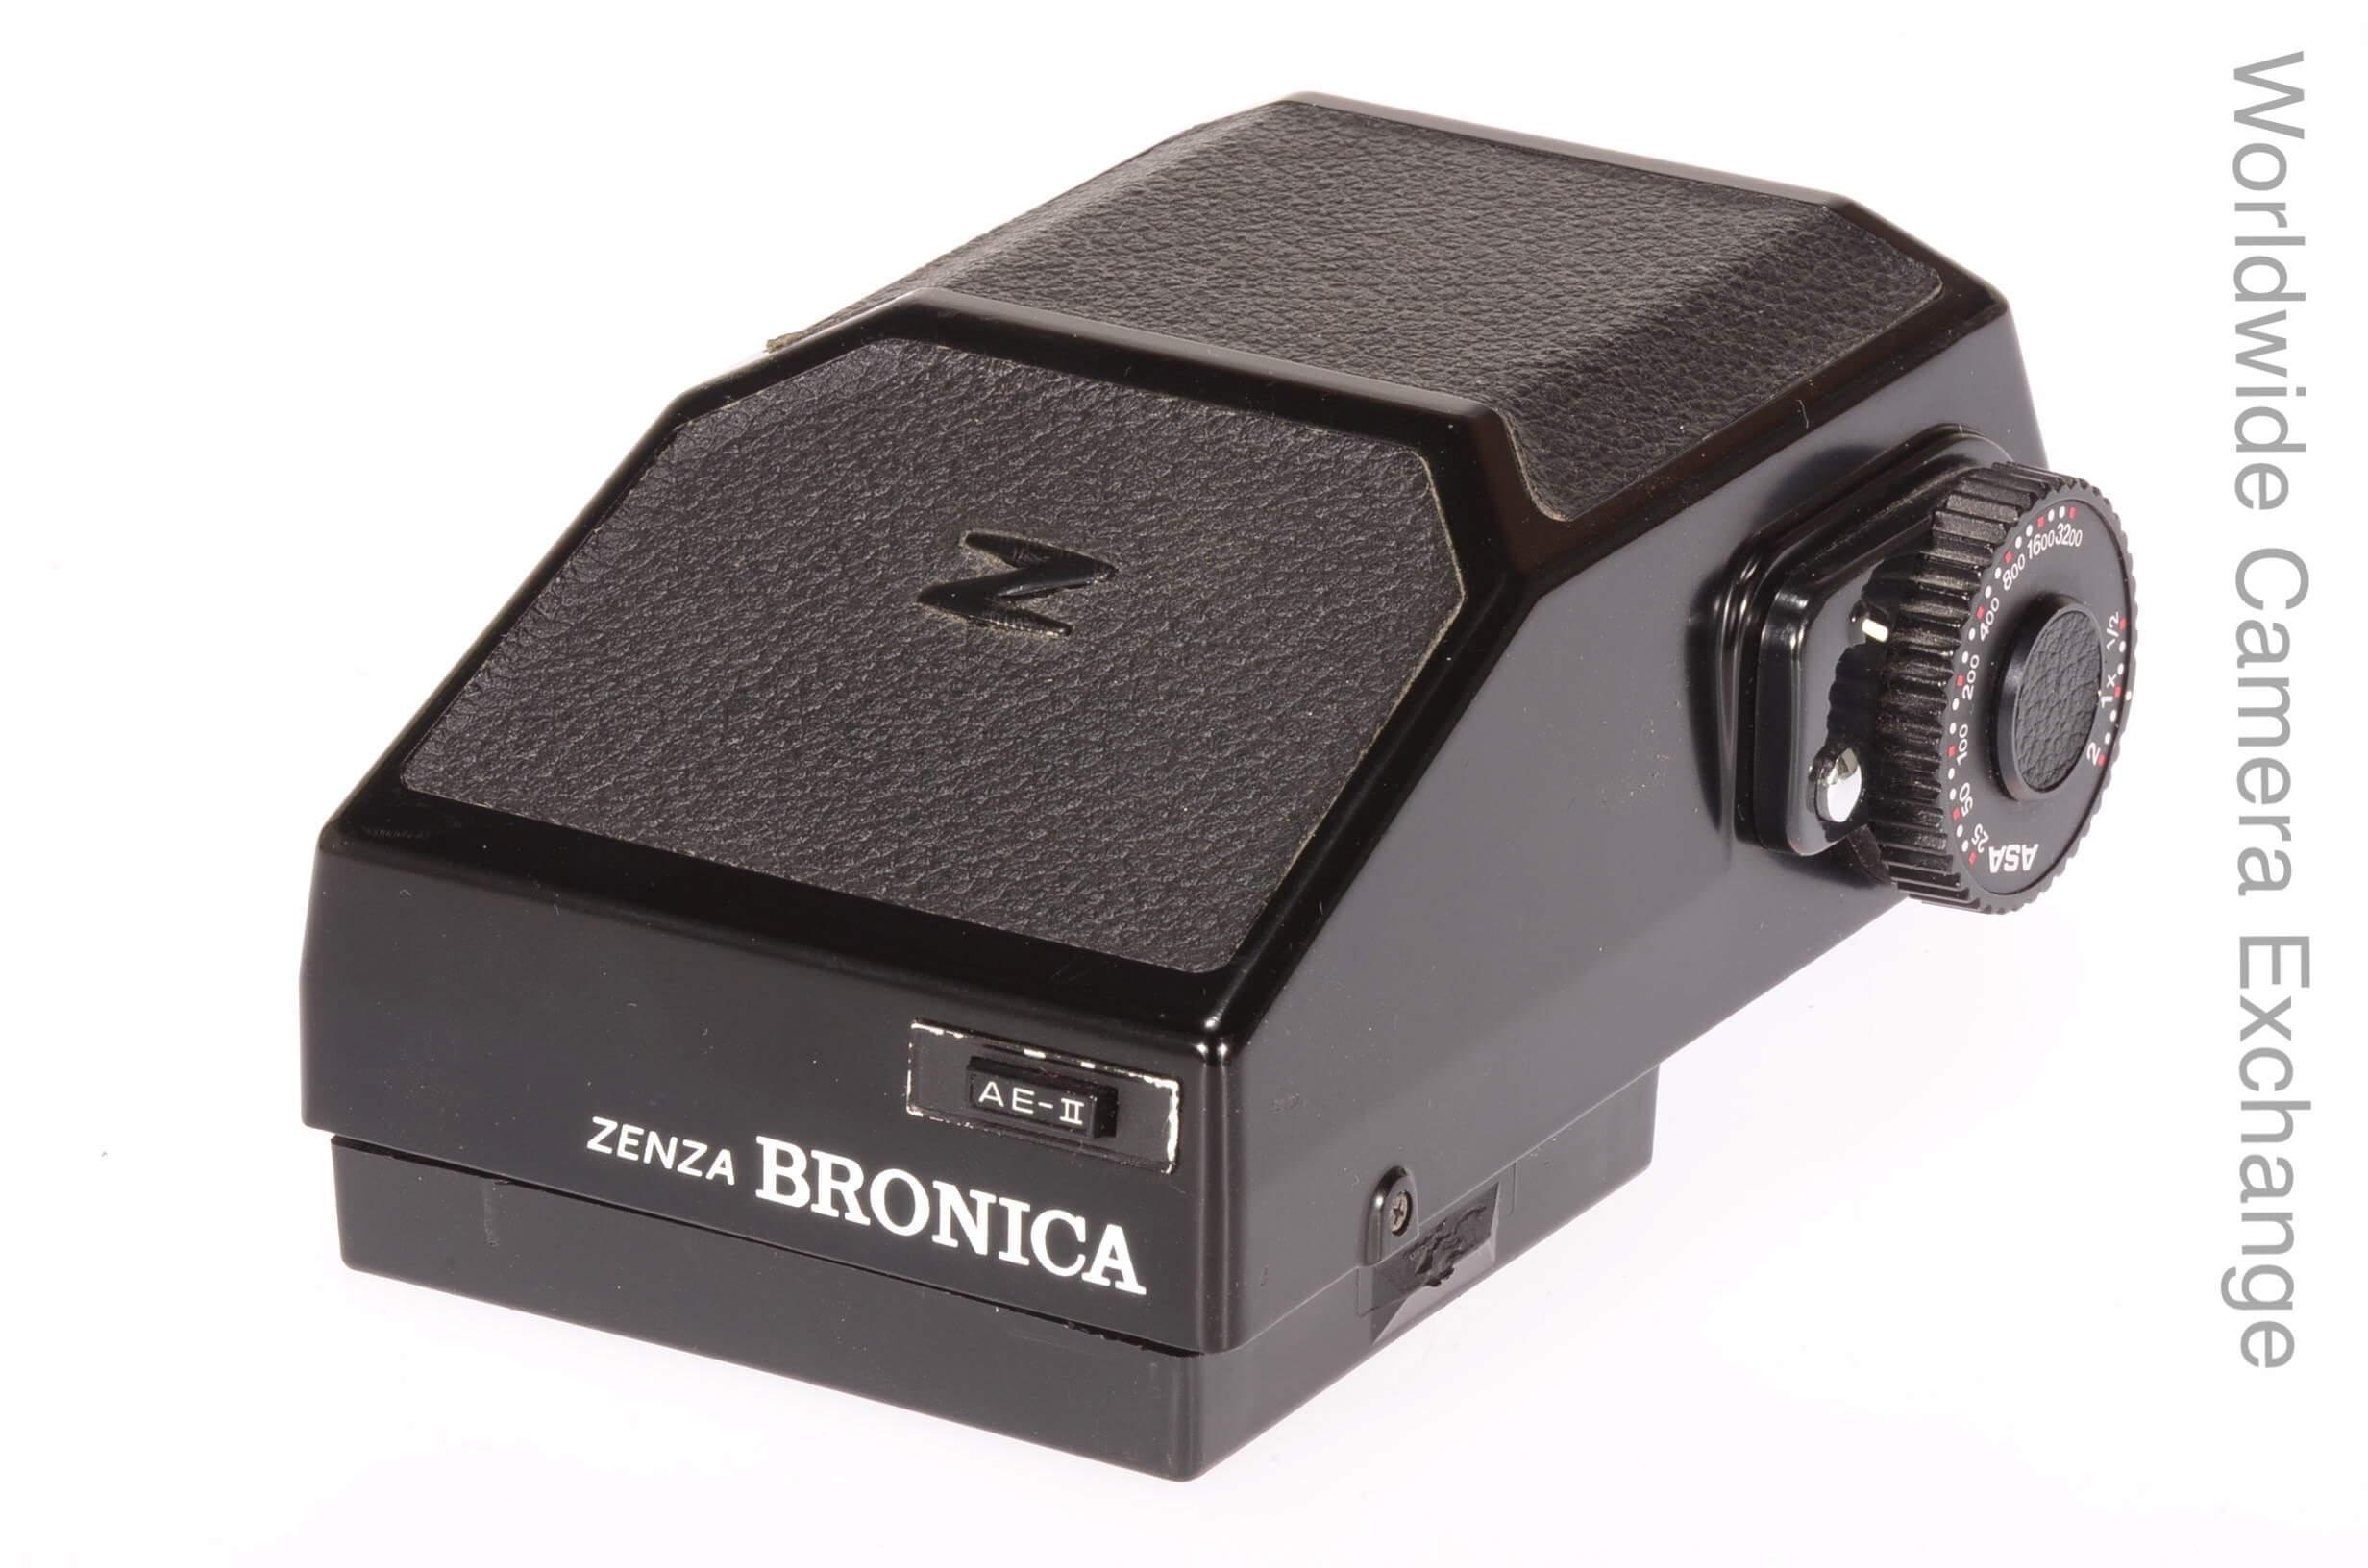 Bronica AEII prism